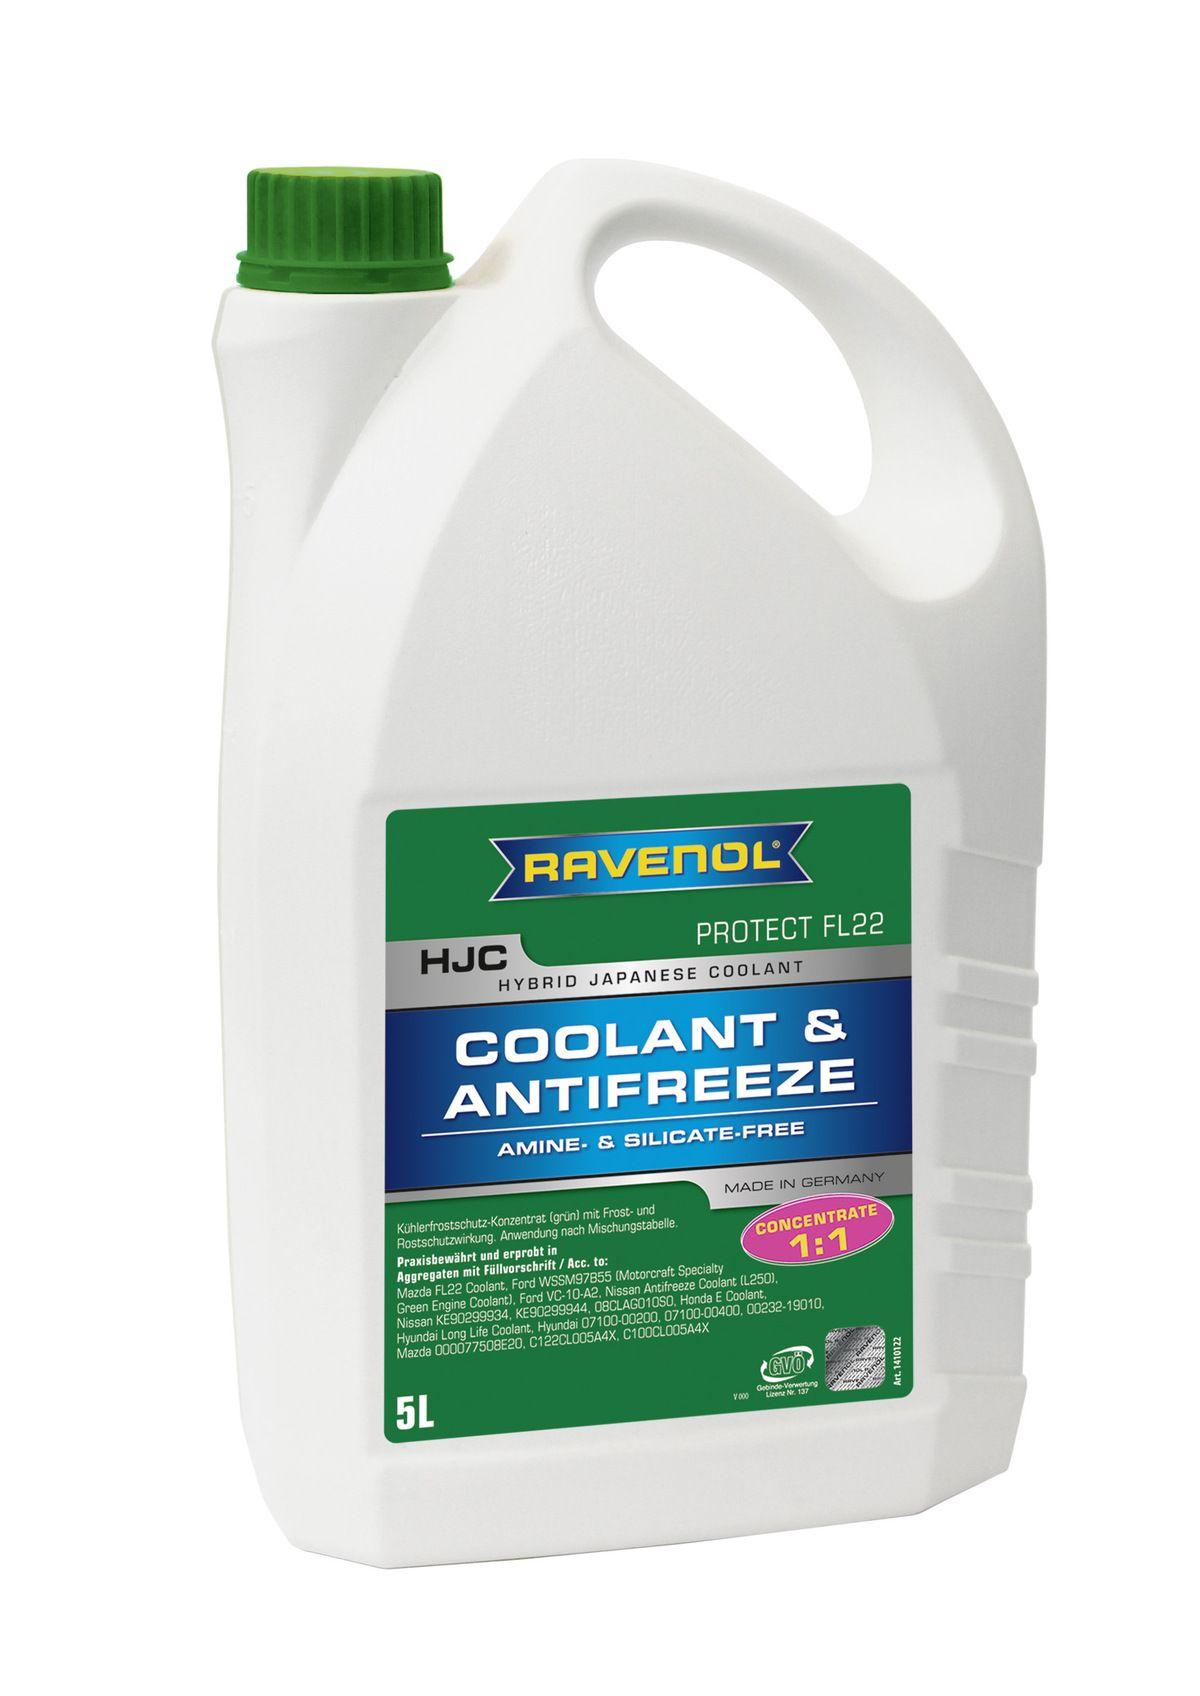 Антифриз концентрат зеленый Ravenol HJC Hybrid Japanese Coolant Concentrate (5 л) от Ravta